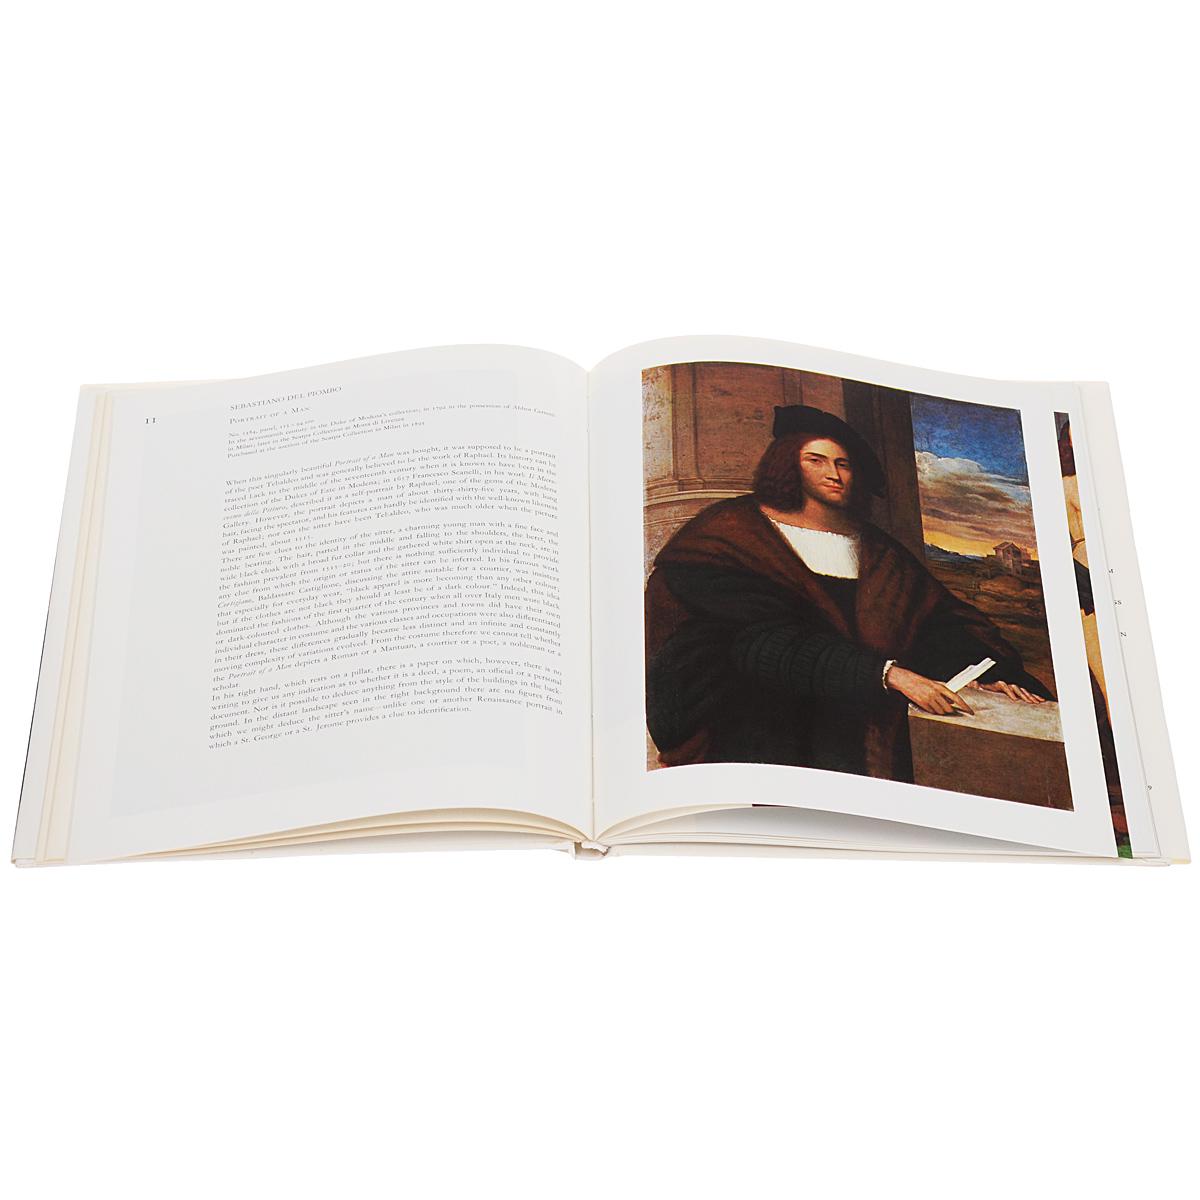 Italian renaissance portraits